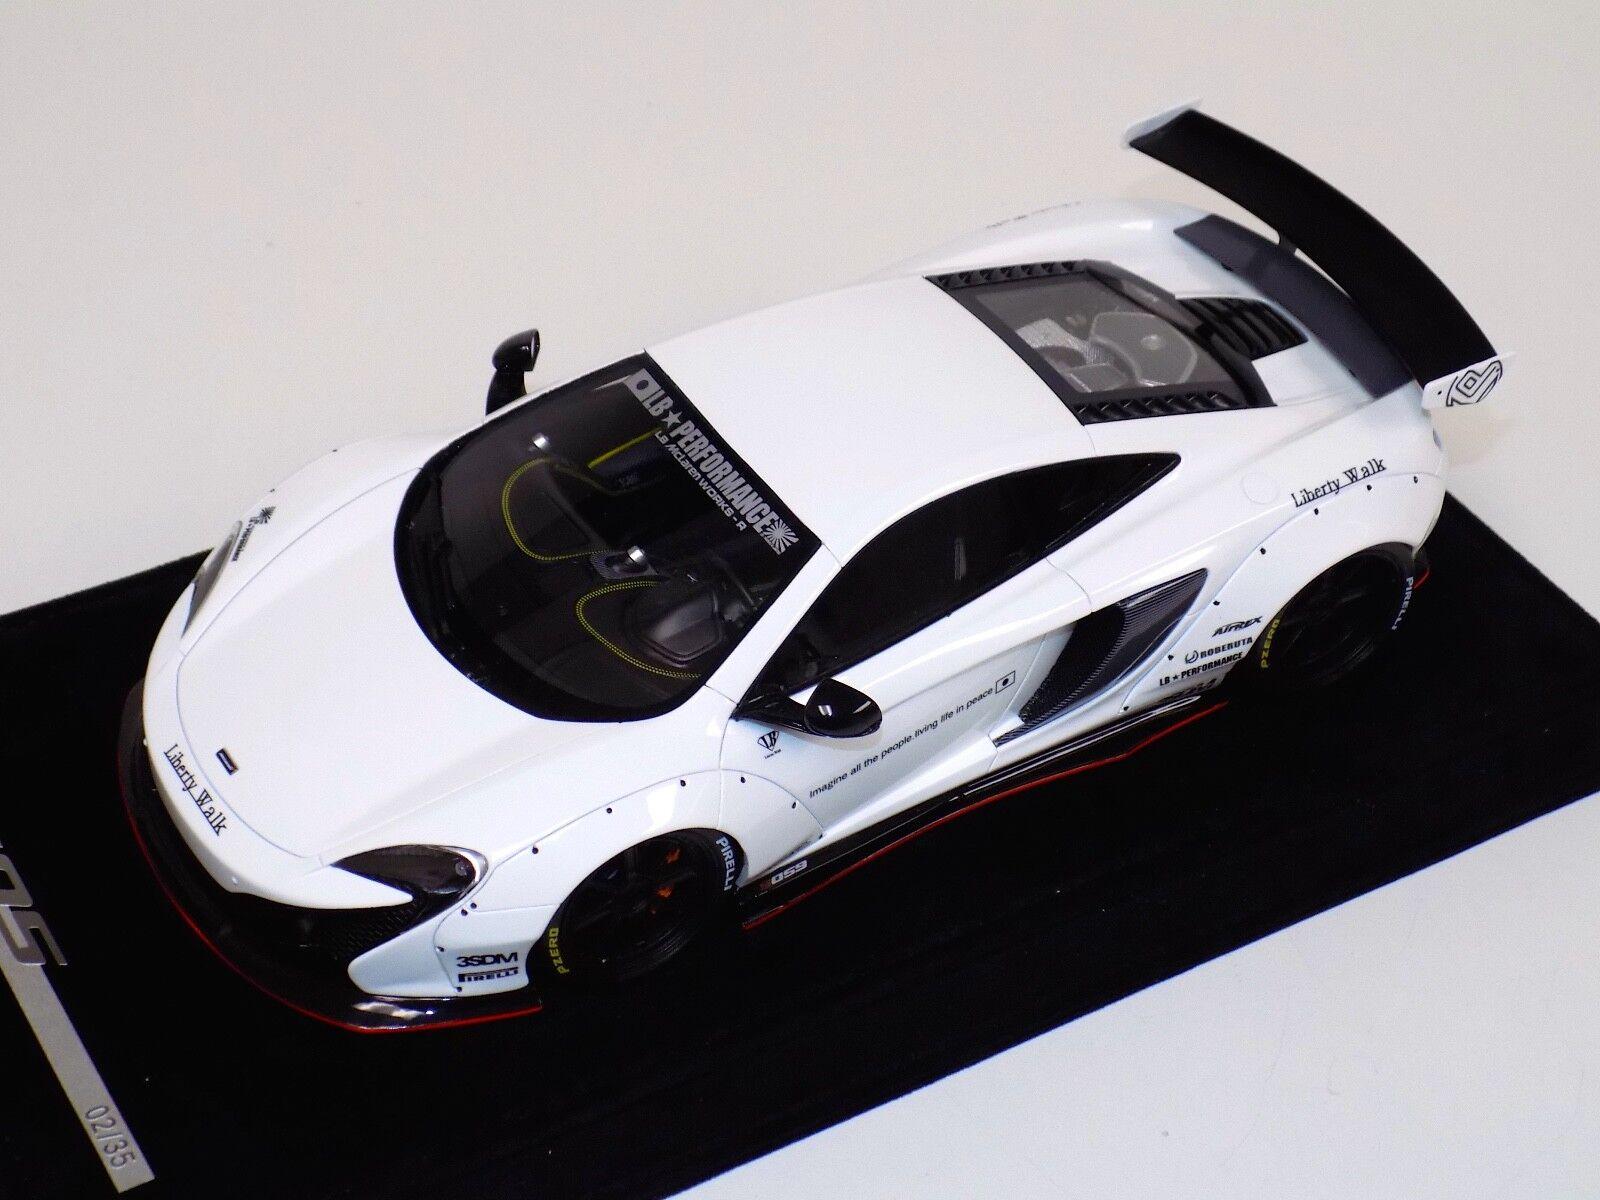 1 18 AB Models McLaren 650 S LB Performance Liberty walk Gloss bianca with decals